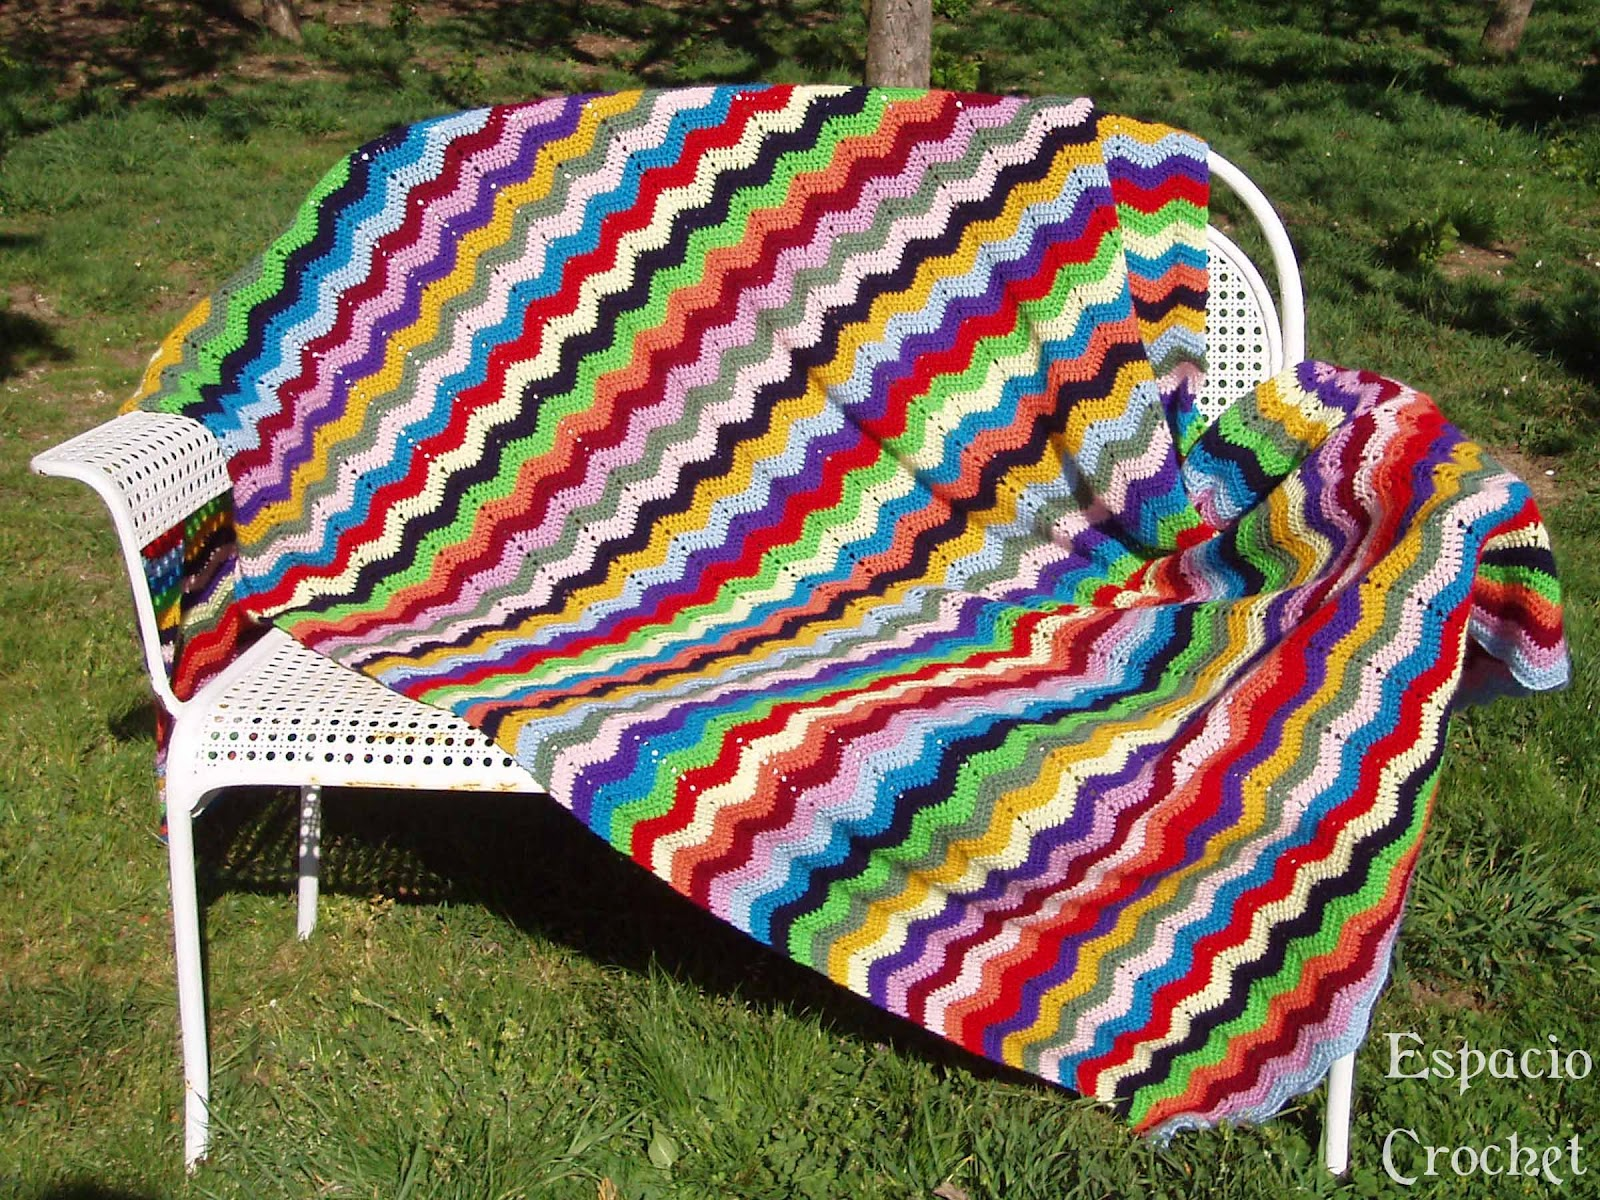 Manta De Crochet Facil - Diseno De Interiores - Publum.com